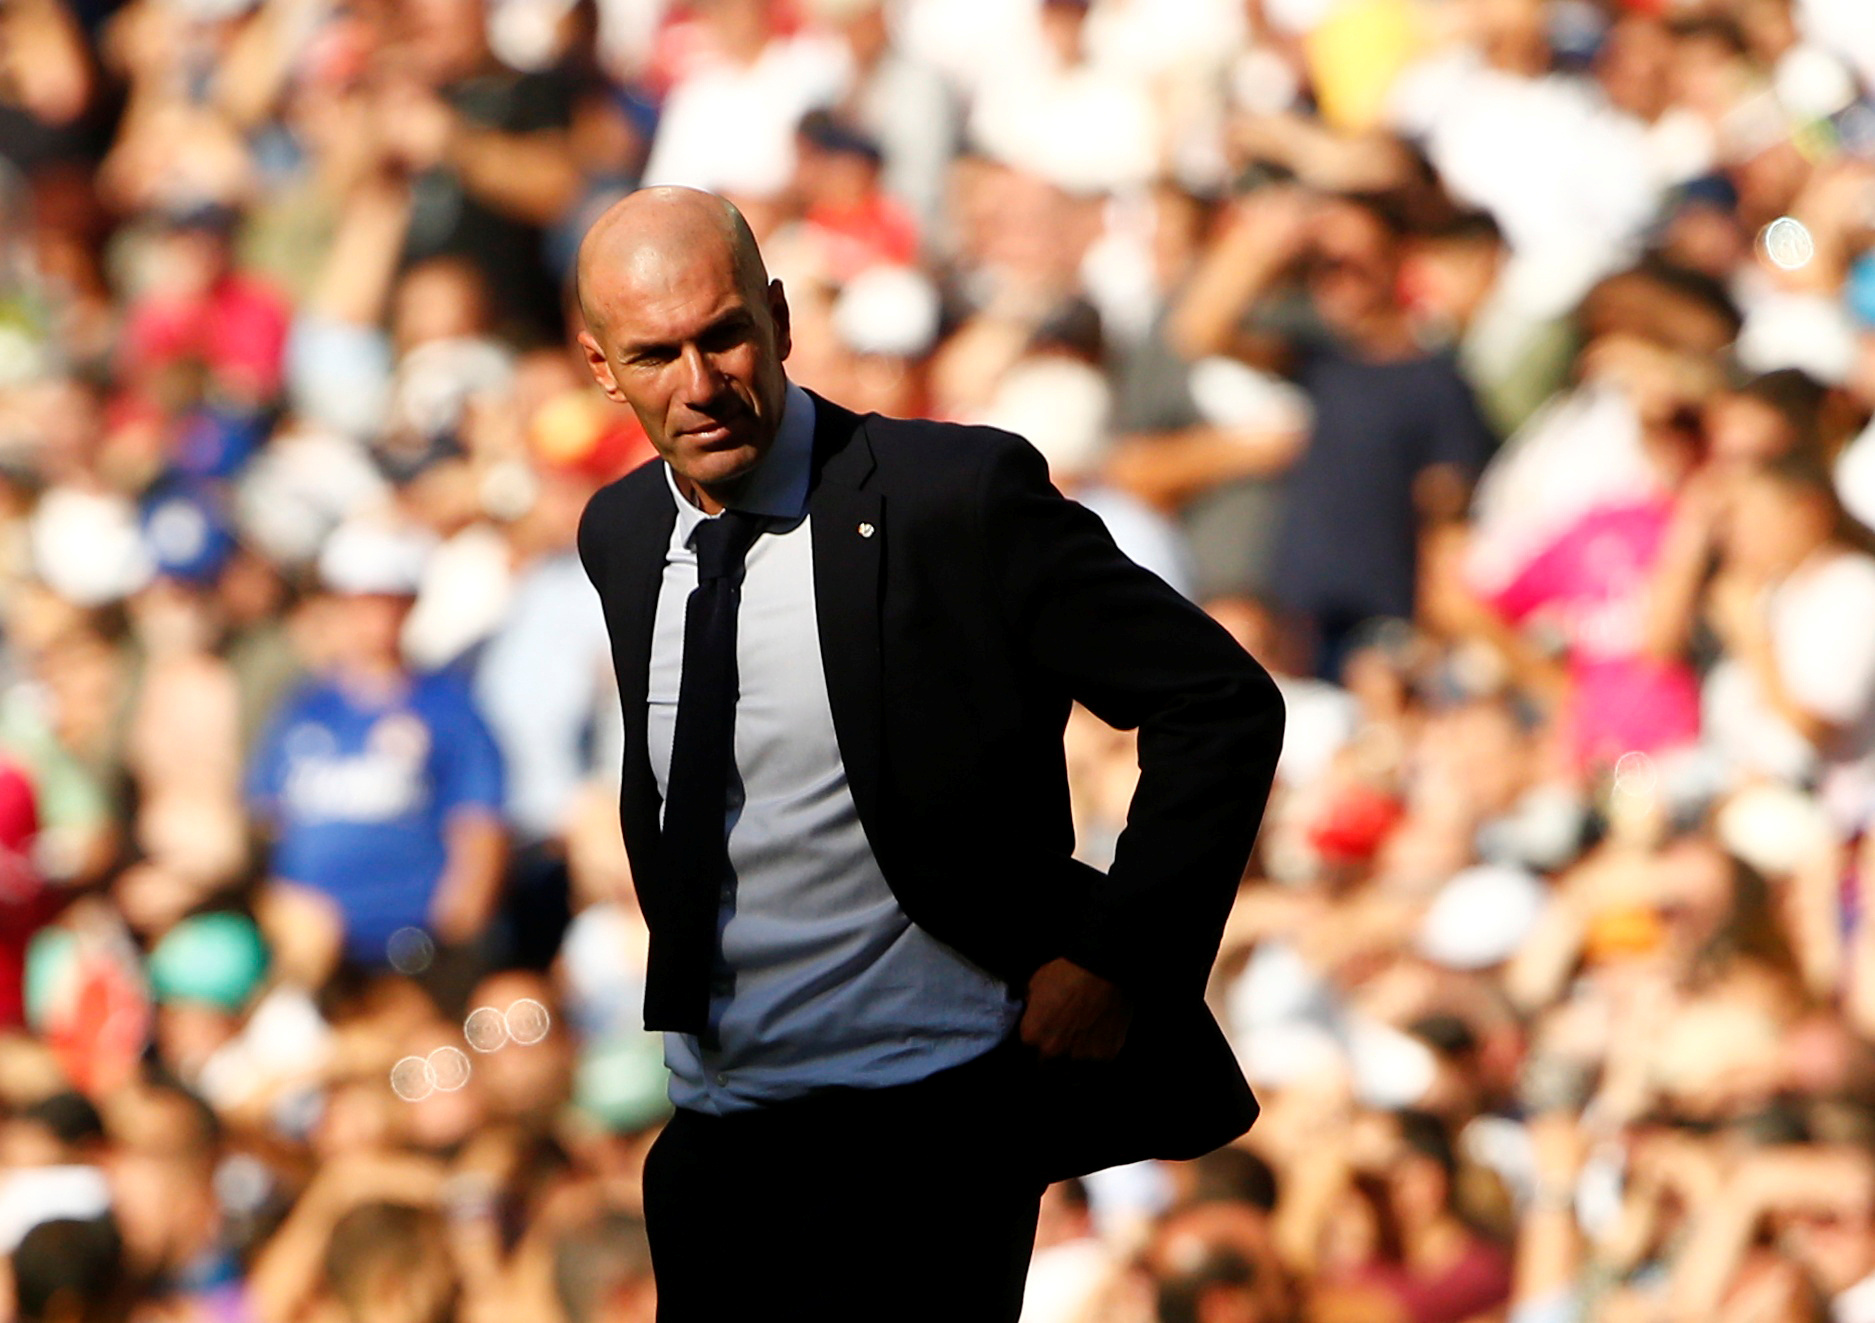 Soccer Football - La Liga Santander - Real Madrid v Granada - Santiago Bernabeu, Madrid, Spain - October 5, 2019  Real Madrid coach Zinedine Zidane during the match       REUTERS/Javier Barbancho - RC1120974CB0